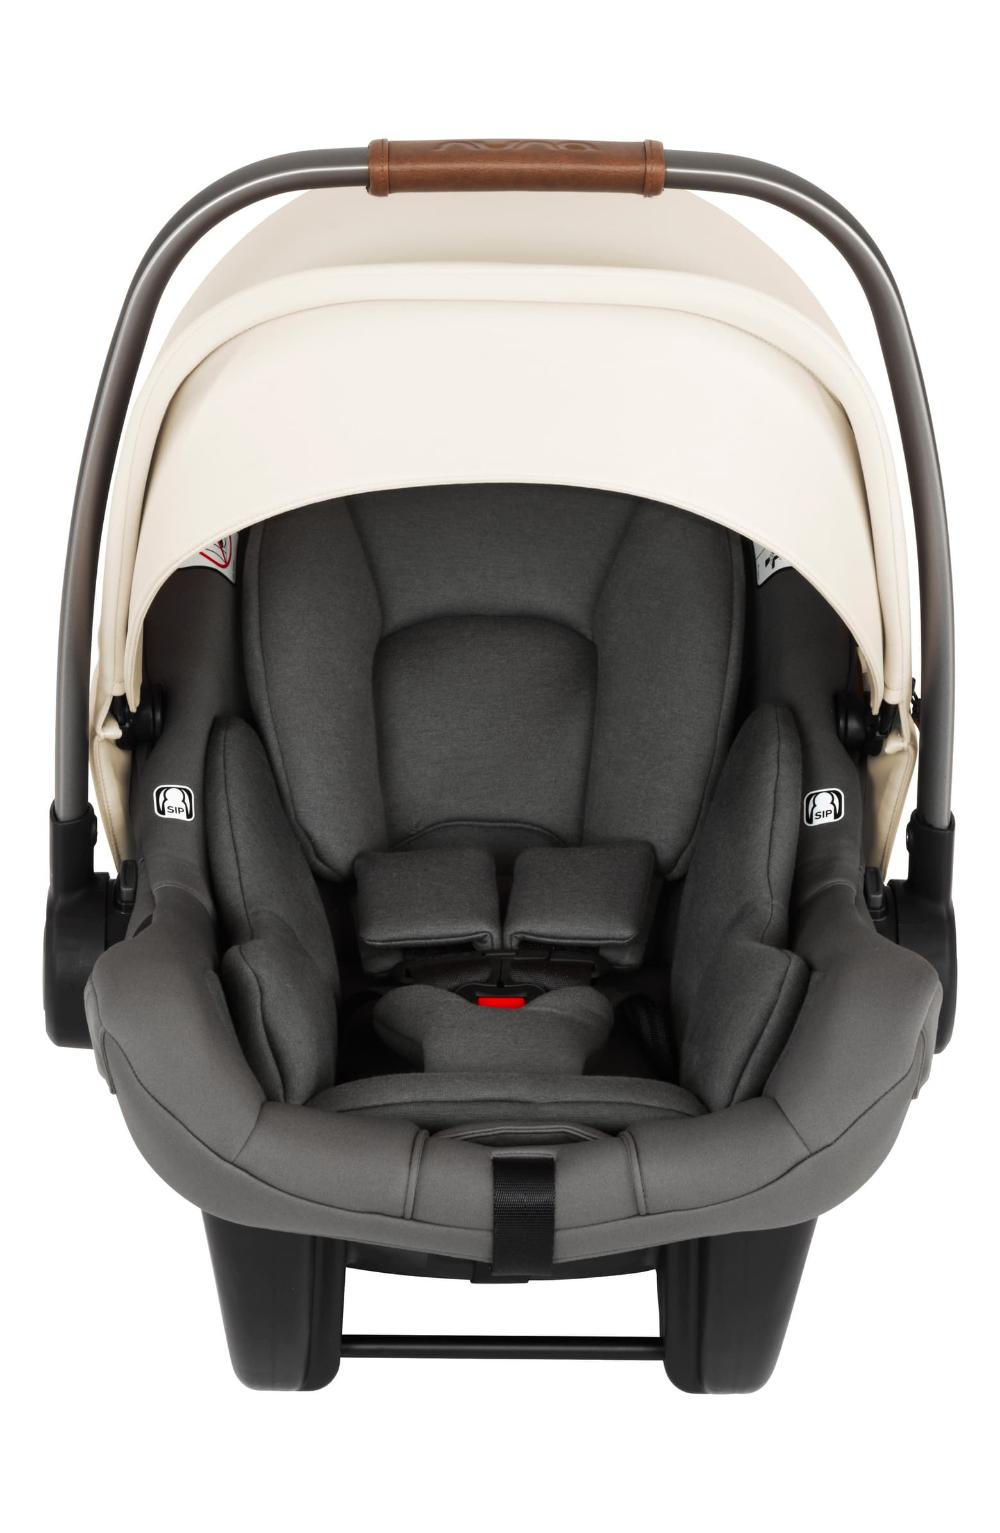 Nuna Pipa Lite Lx Infant Car Seat Base Baby Car Seats Infant